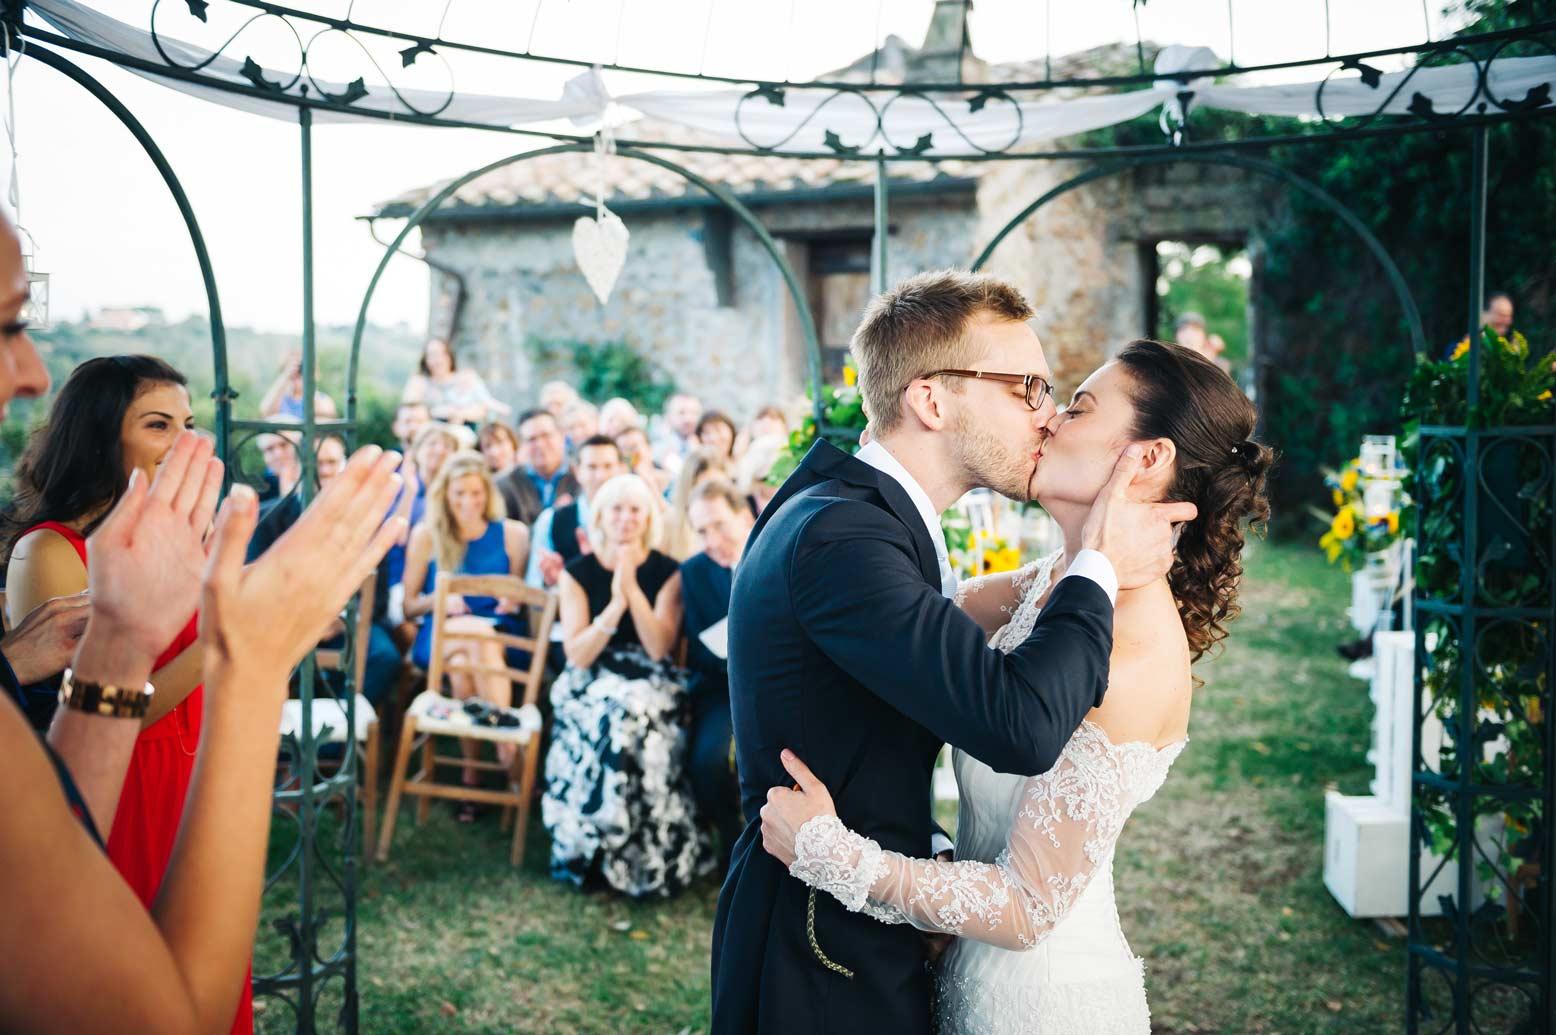 Fotografo-Matrimoni-Reportage-Cerimonia